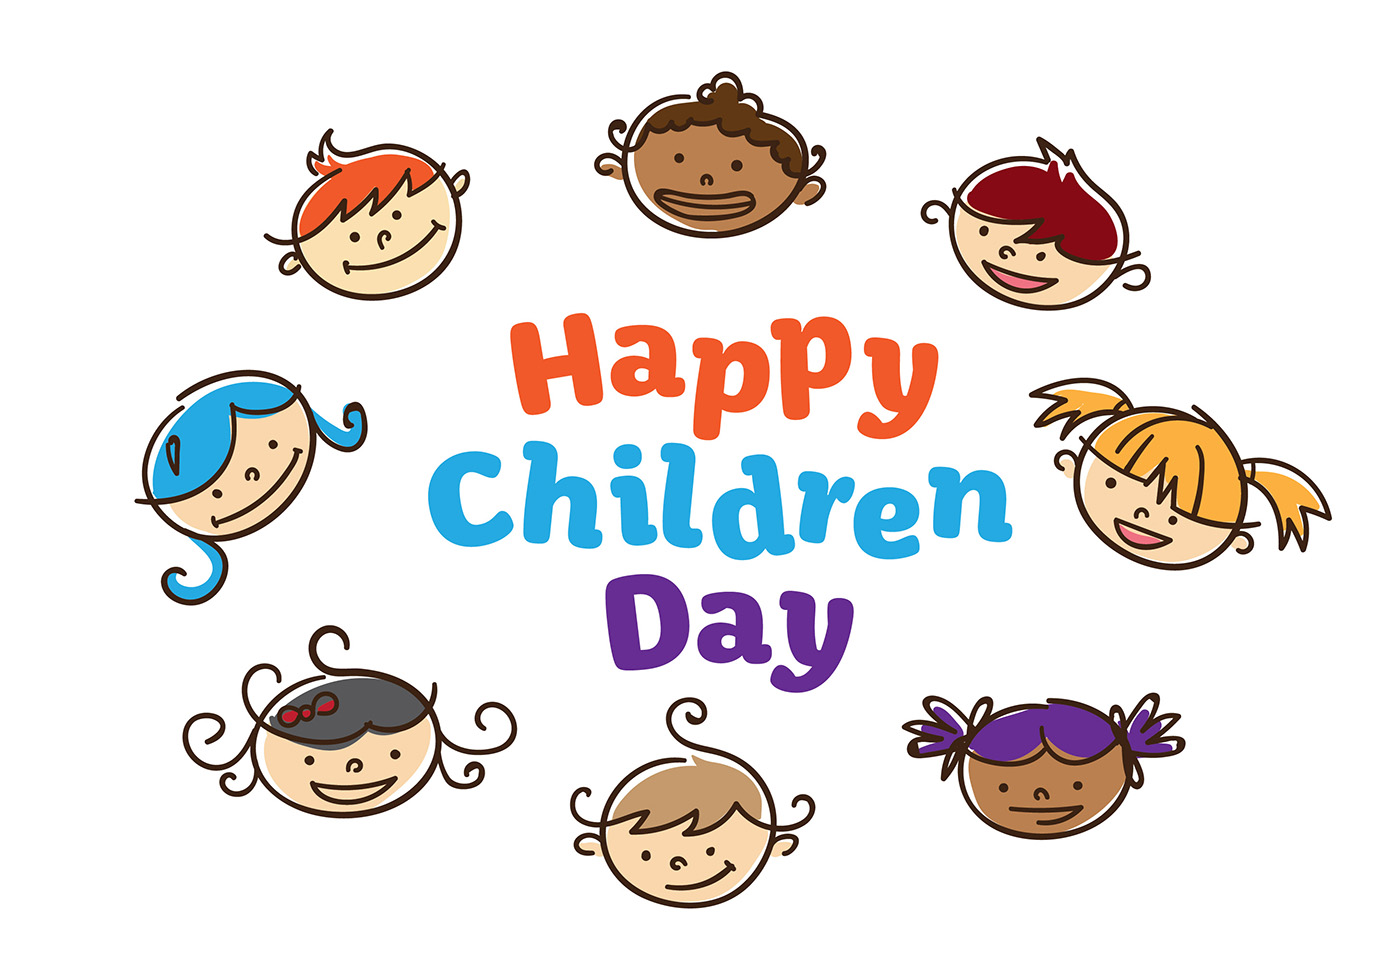 Children day vector download free vector art stock graphics images - Children s day images download ...